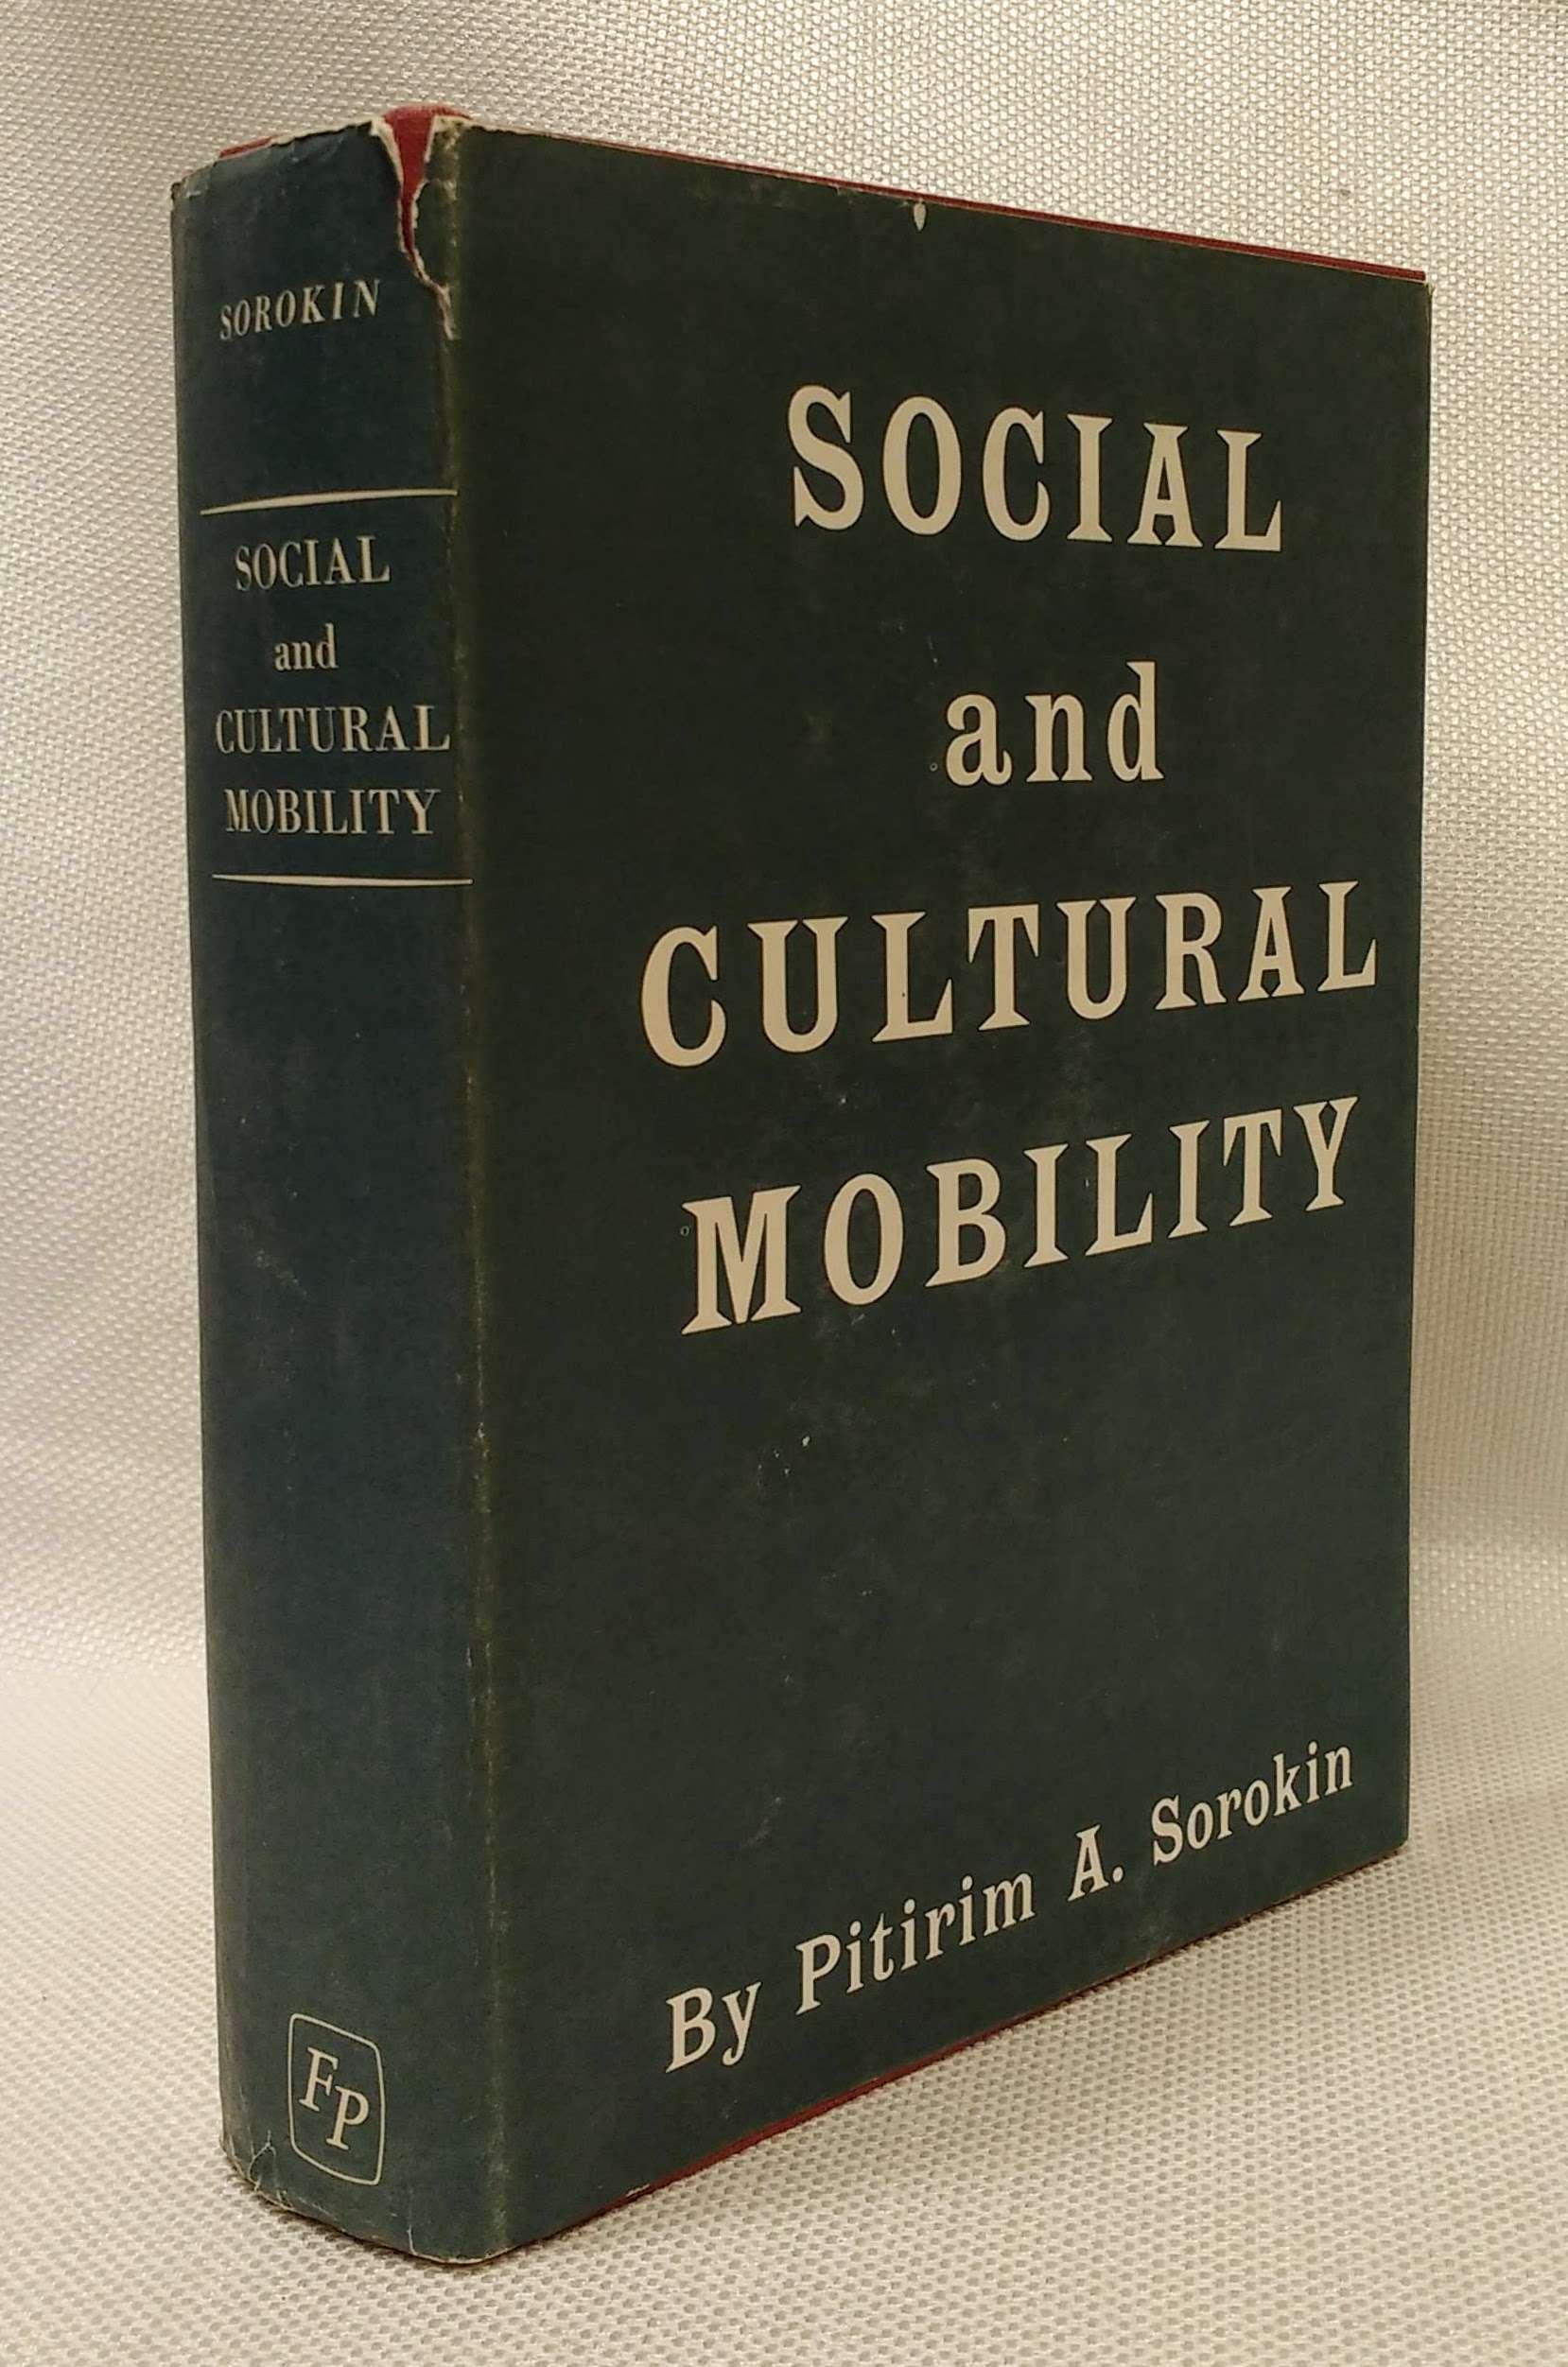 Social and Cultural Mobility, Pitirim A. Sorokin